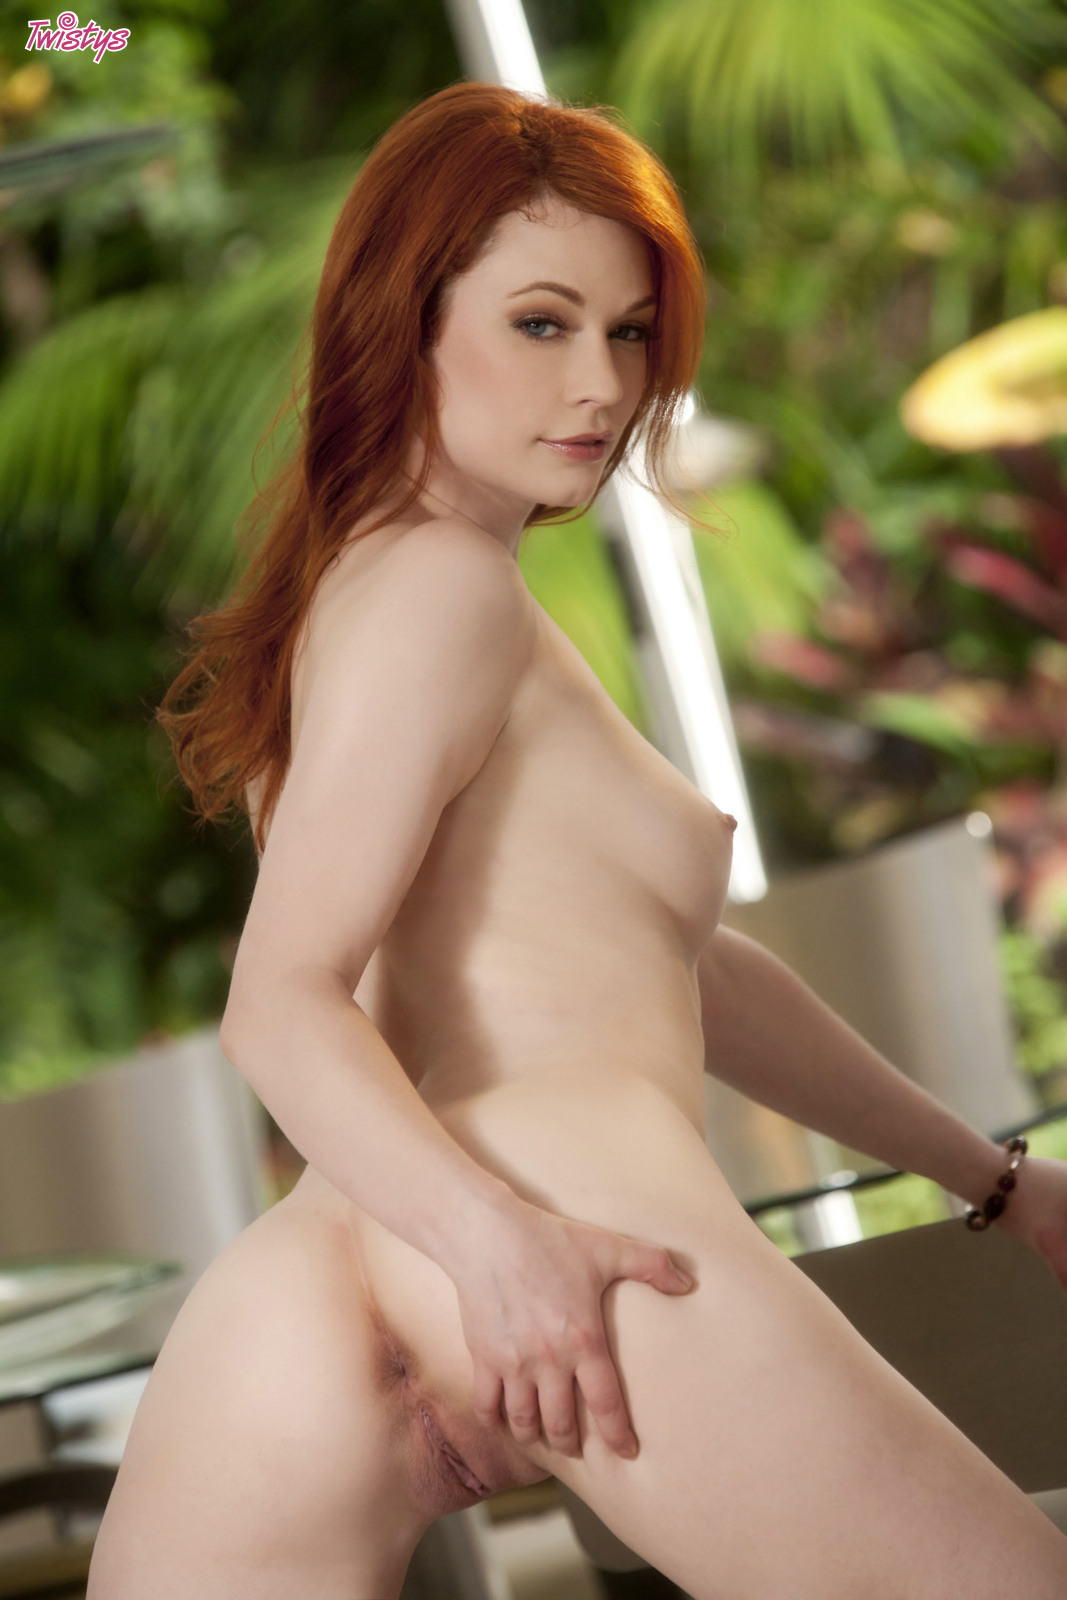 4206973_138627791422_baldcunt_erotiqlinks_greatass_JustineJoli_redhead_sexy.jpg